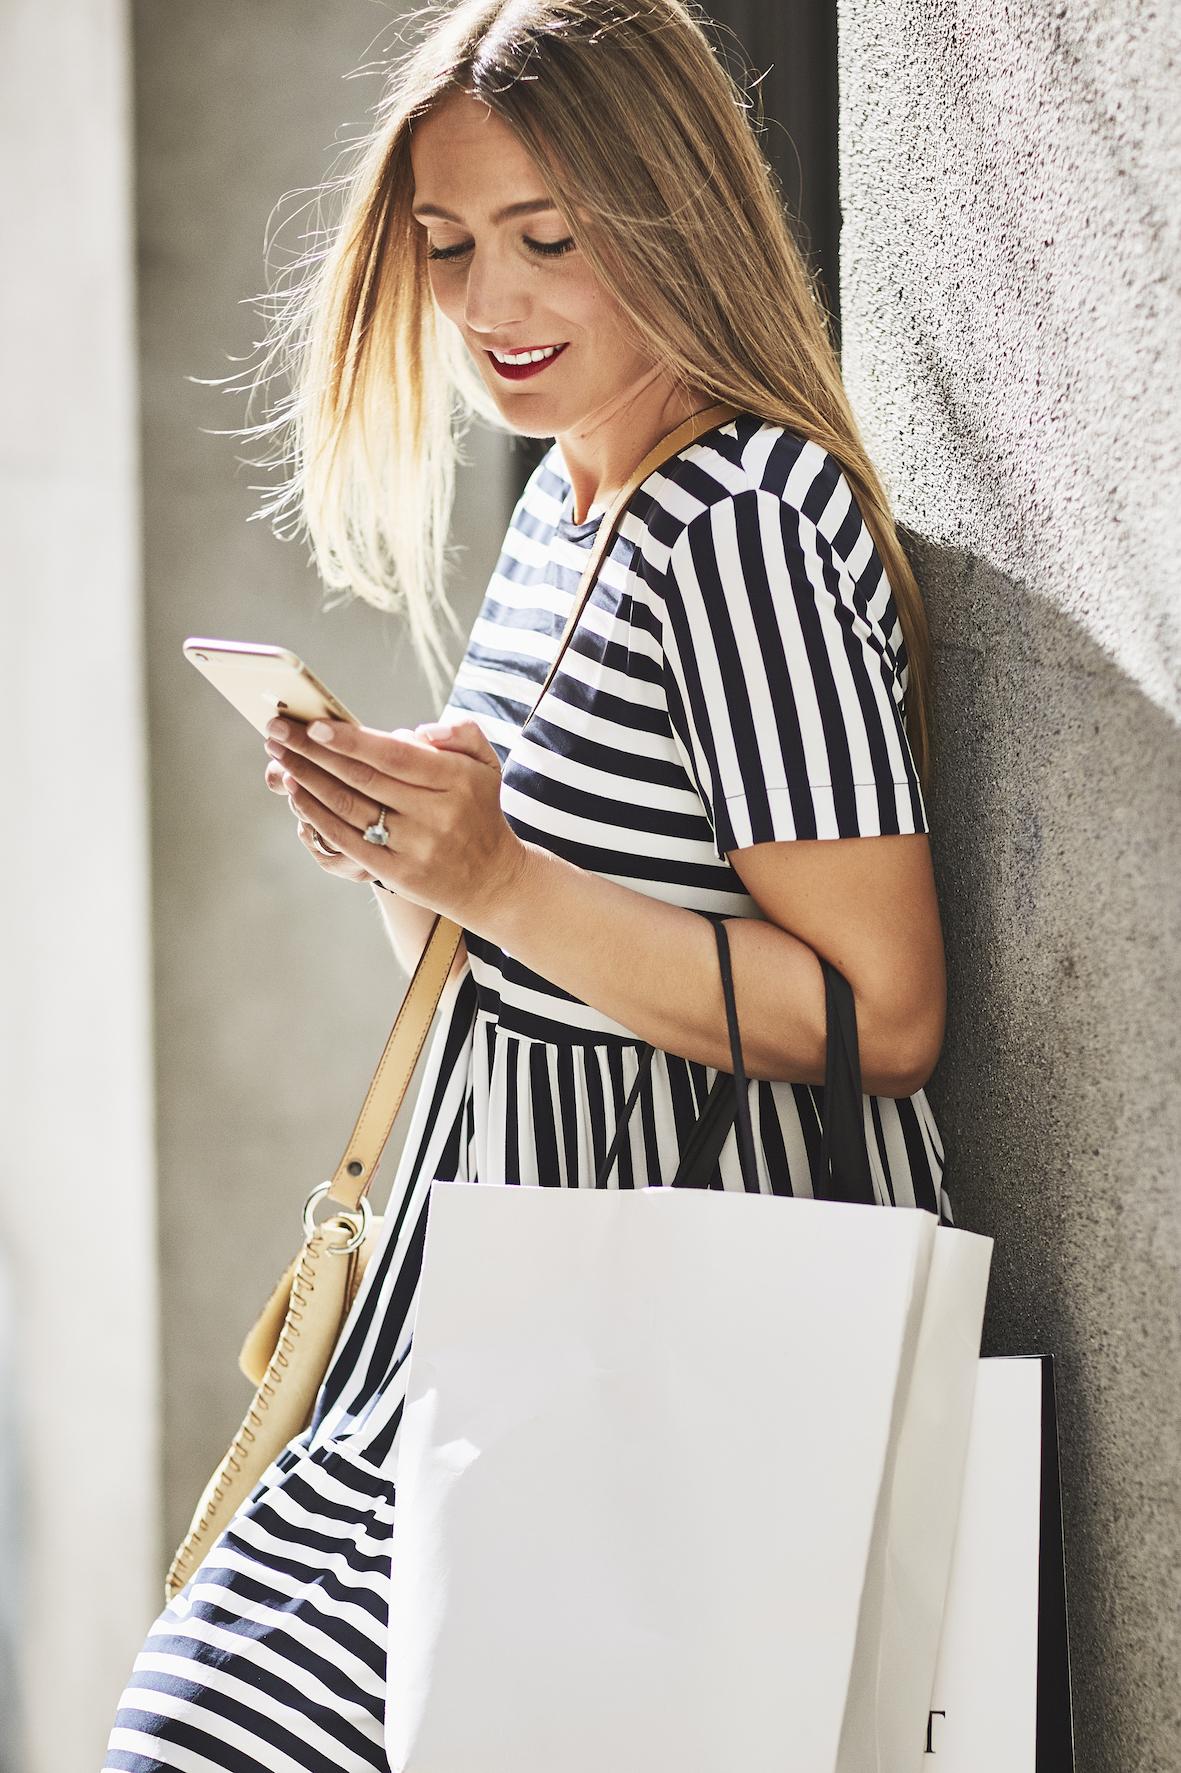 Tienda online Silvia Godino